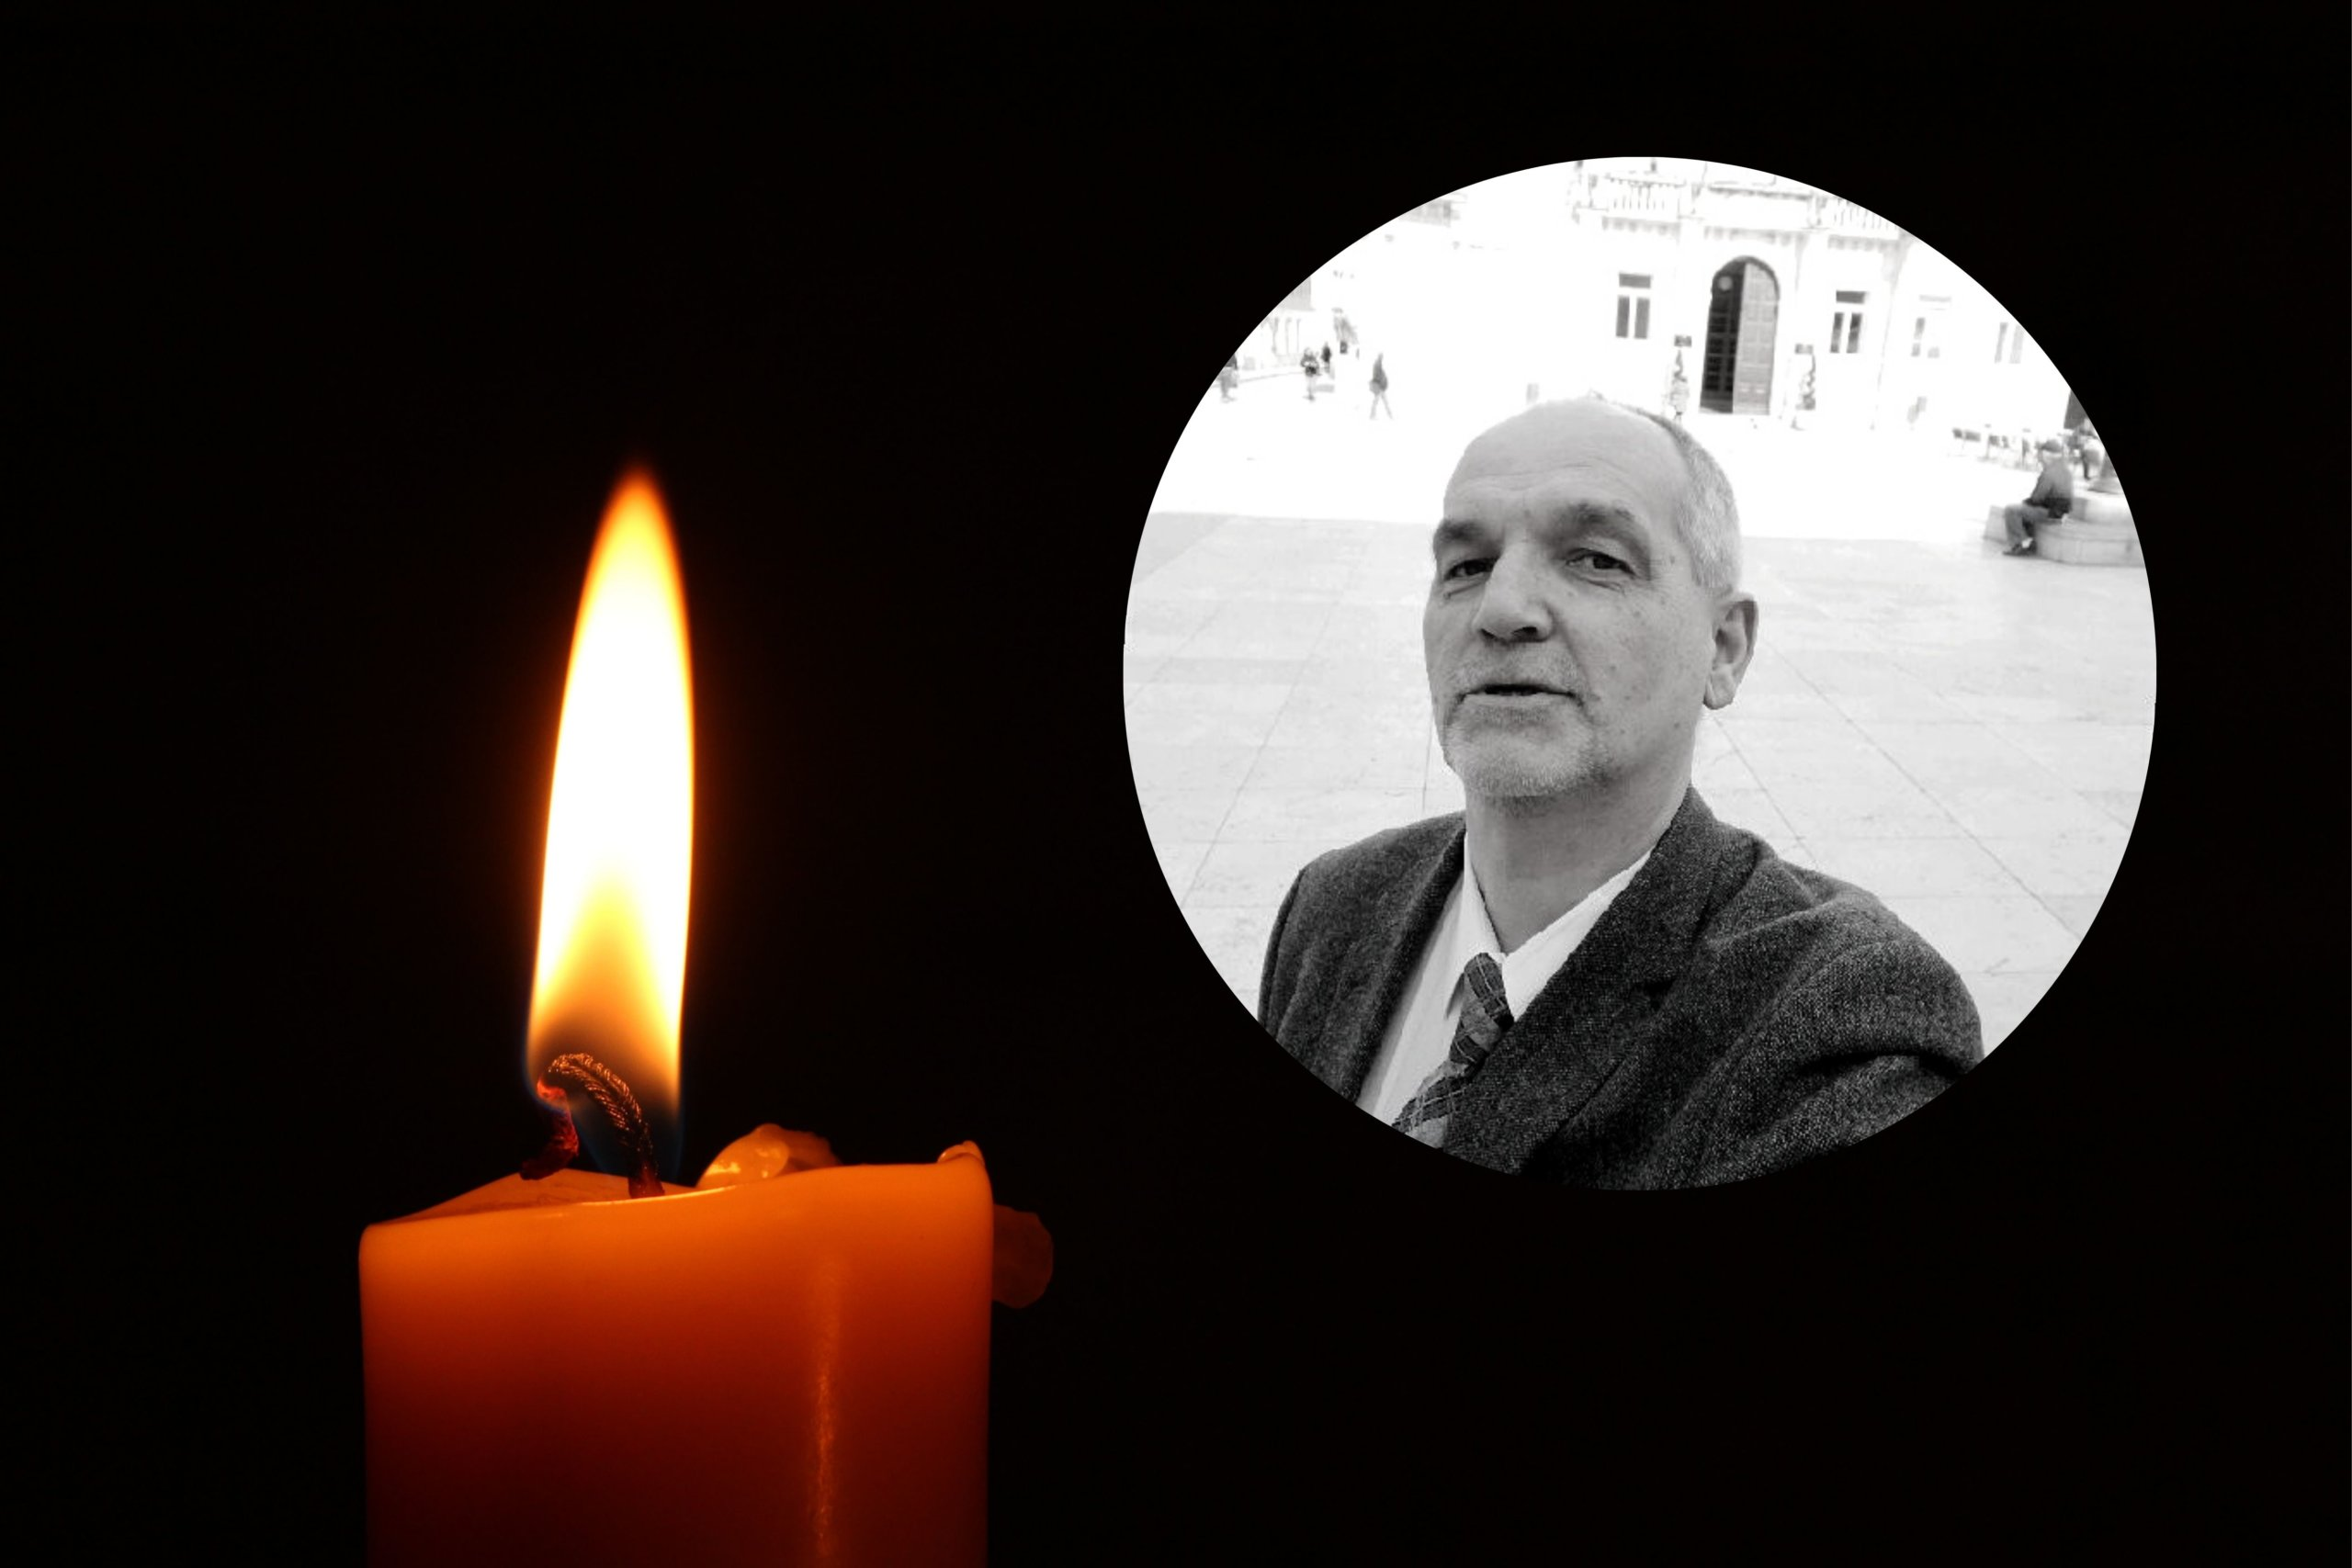 Tuga u NCVVO-u: Preminuo Zlatko Zadelj, dugogodišnji voditelj državne mature